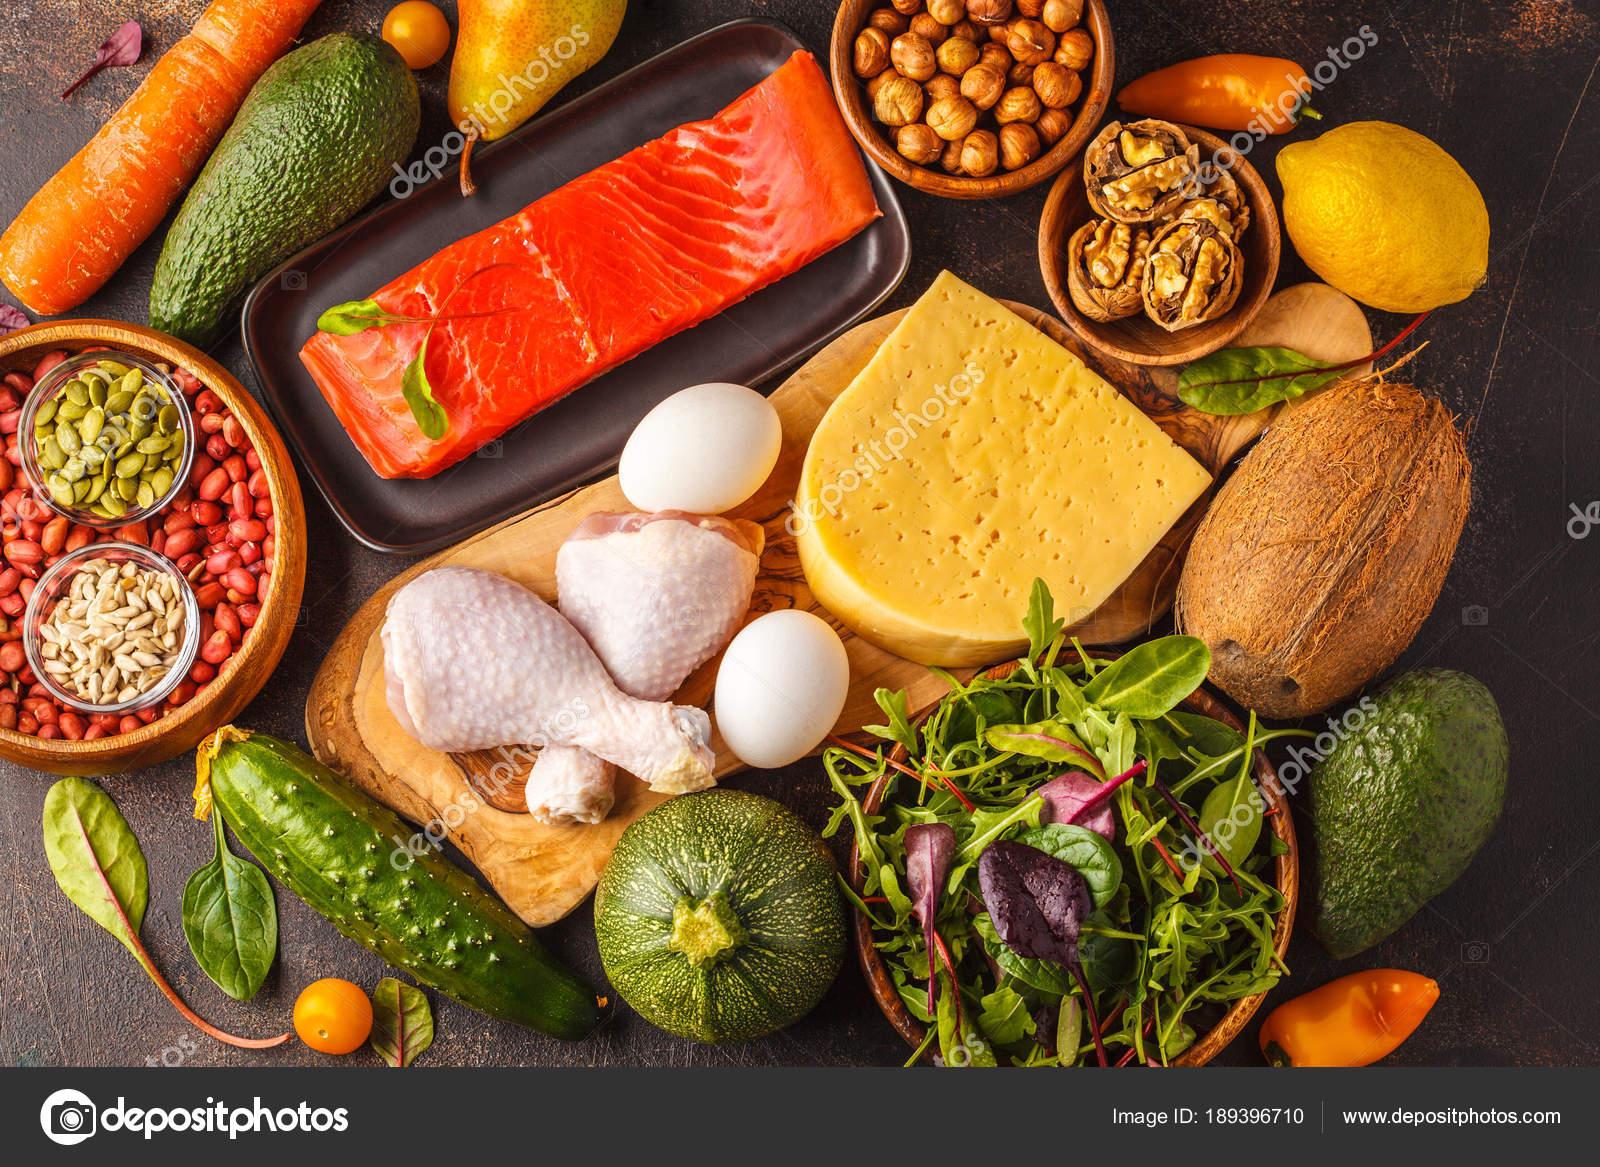 Keto Ketogene Diat Konzept Ausgewogene Low Carb Lebensmittel